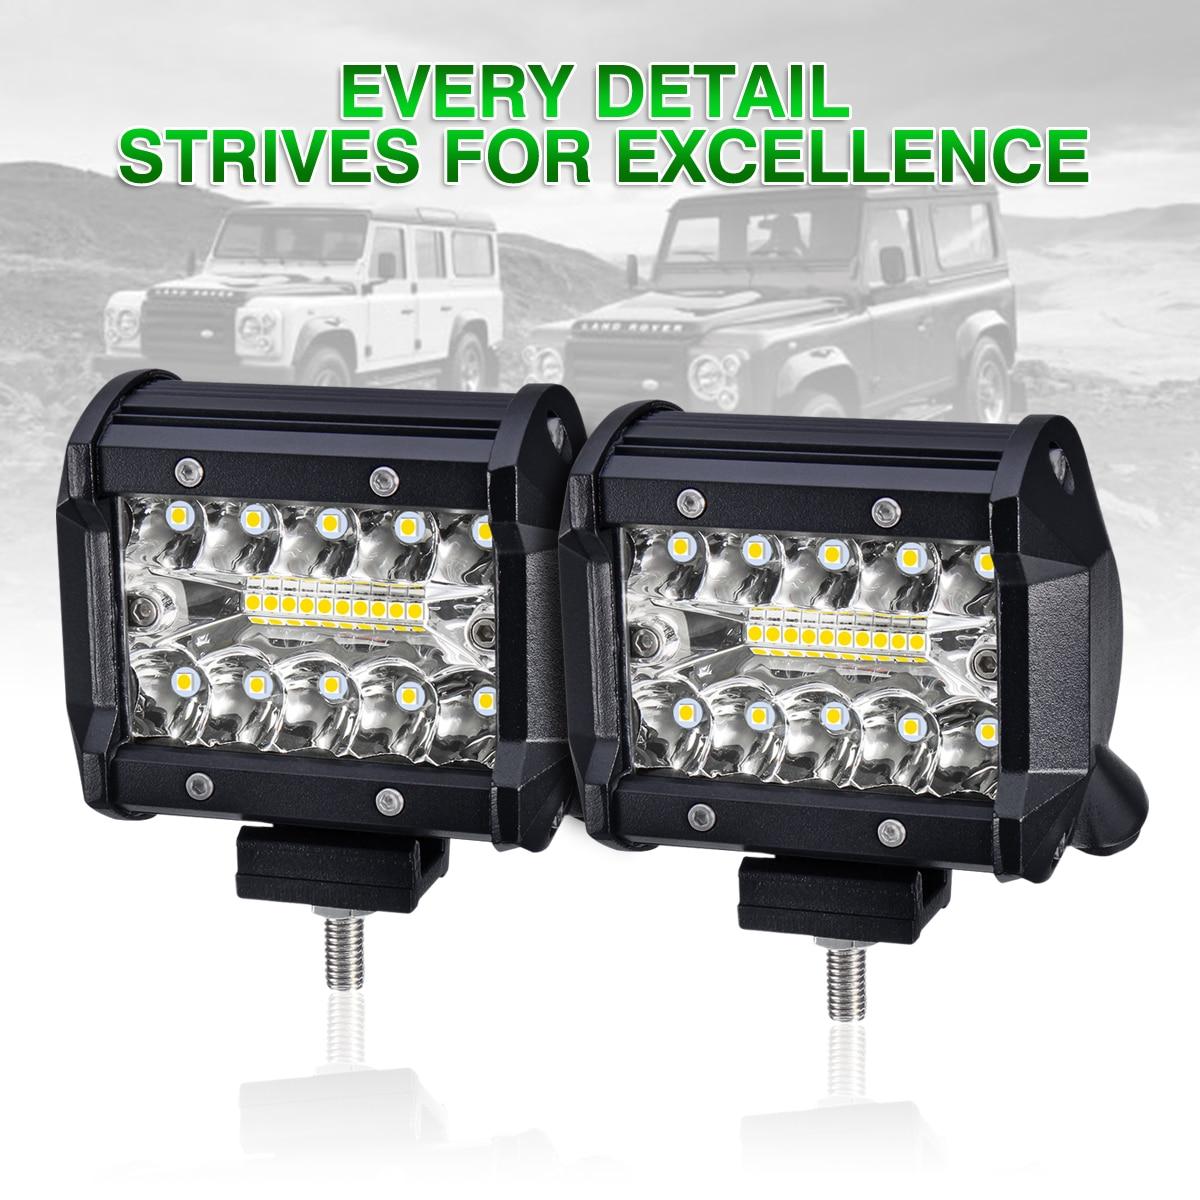 4inch LED Work Light for Car Spot Flood LED Light Bar 2400LM DRL Driving Lamp 12V 24V Waterproof Truck Boat SUV Universal